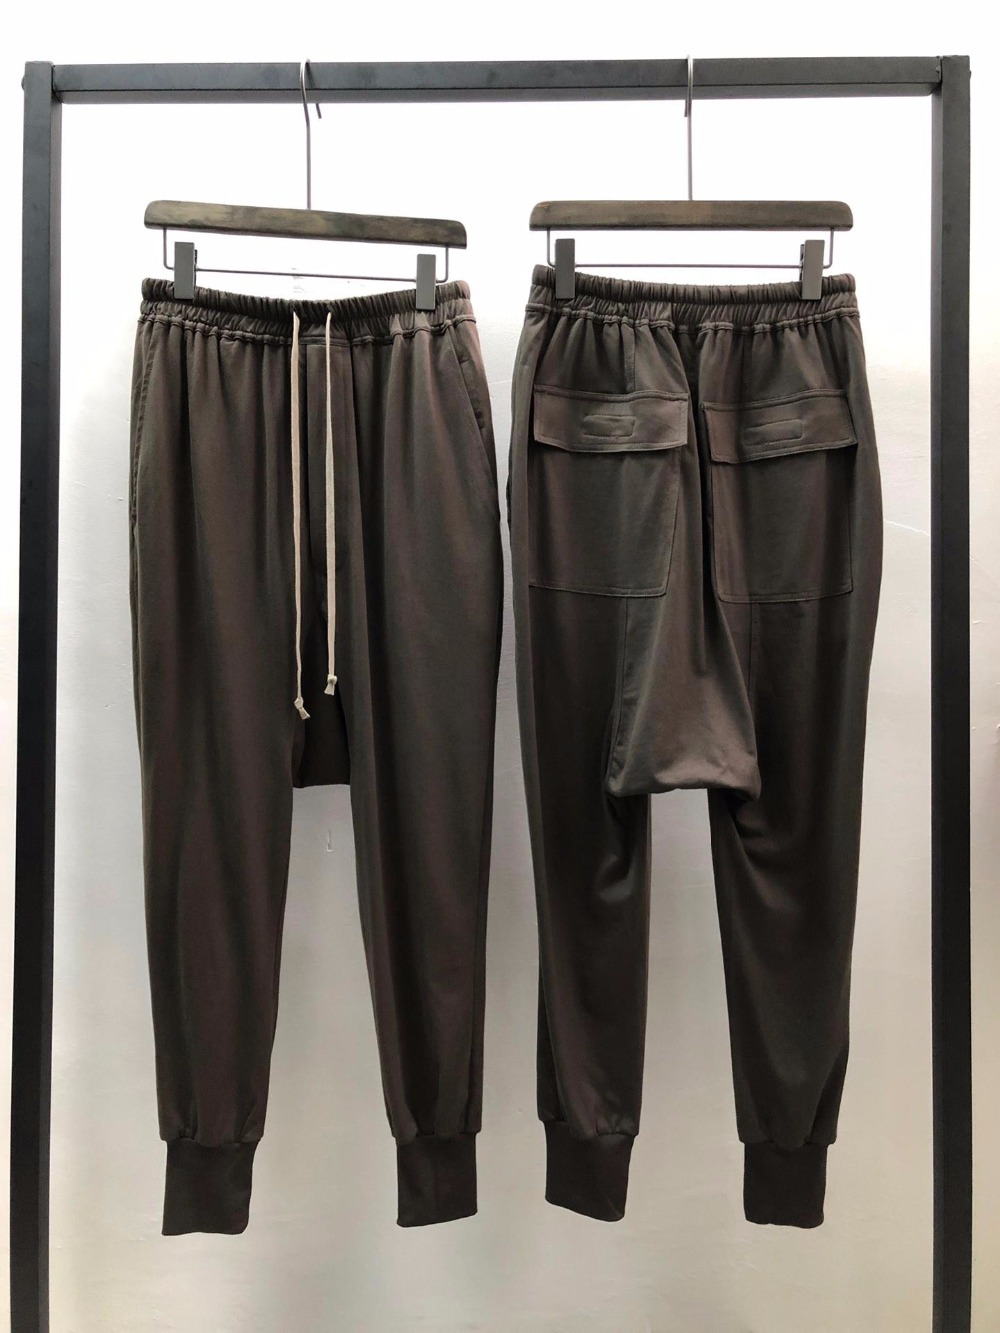 Owen Seak Men Casual Hallen Pants 100% Cotton Gothic Men Clothing Sweatpants Summer Lightweight Women Solid Loose Pants Size XL